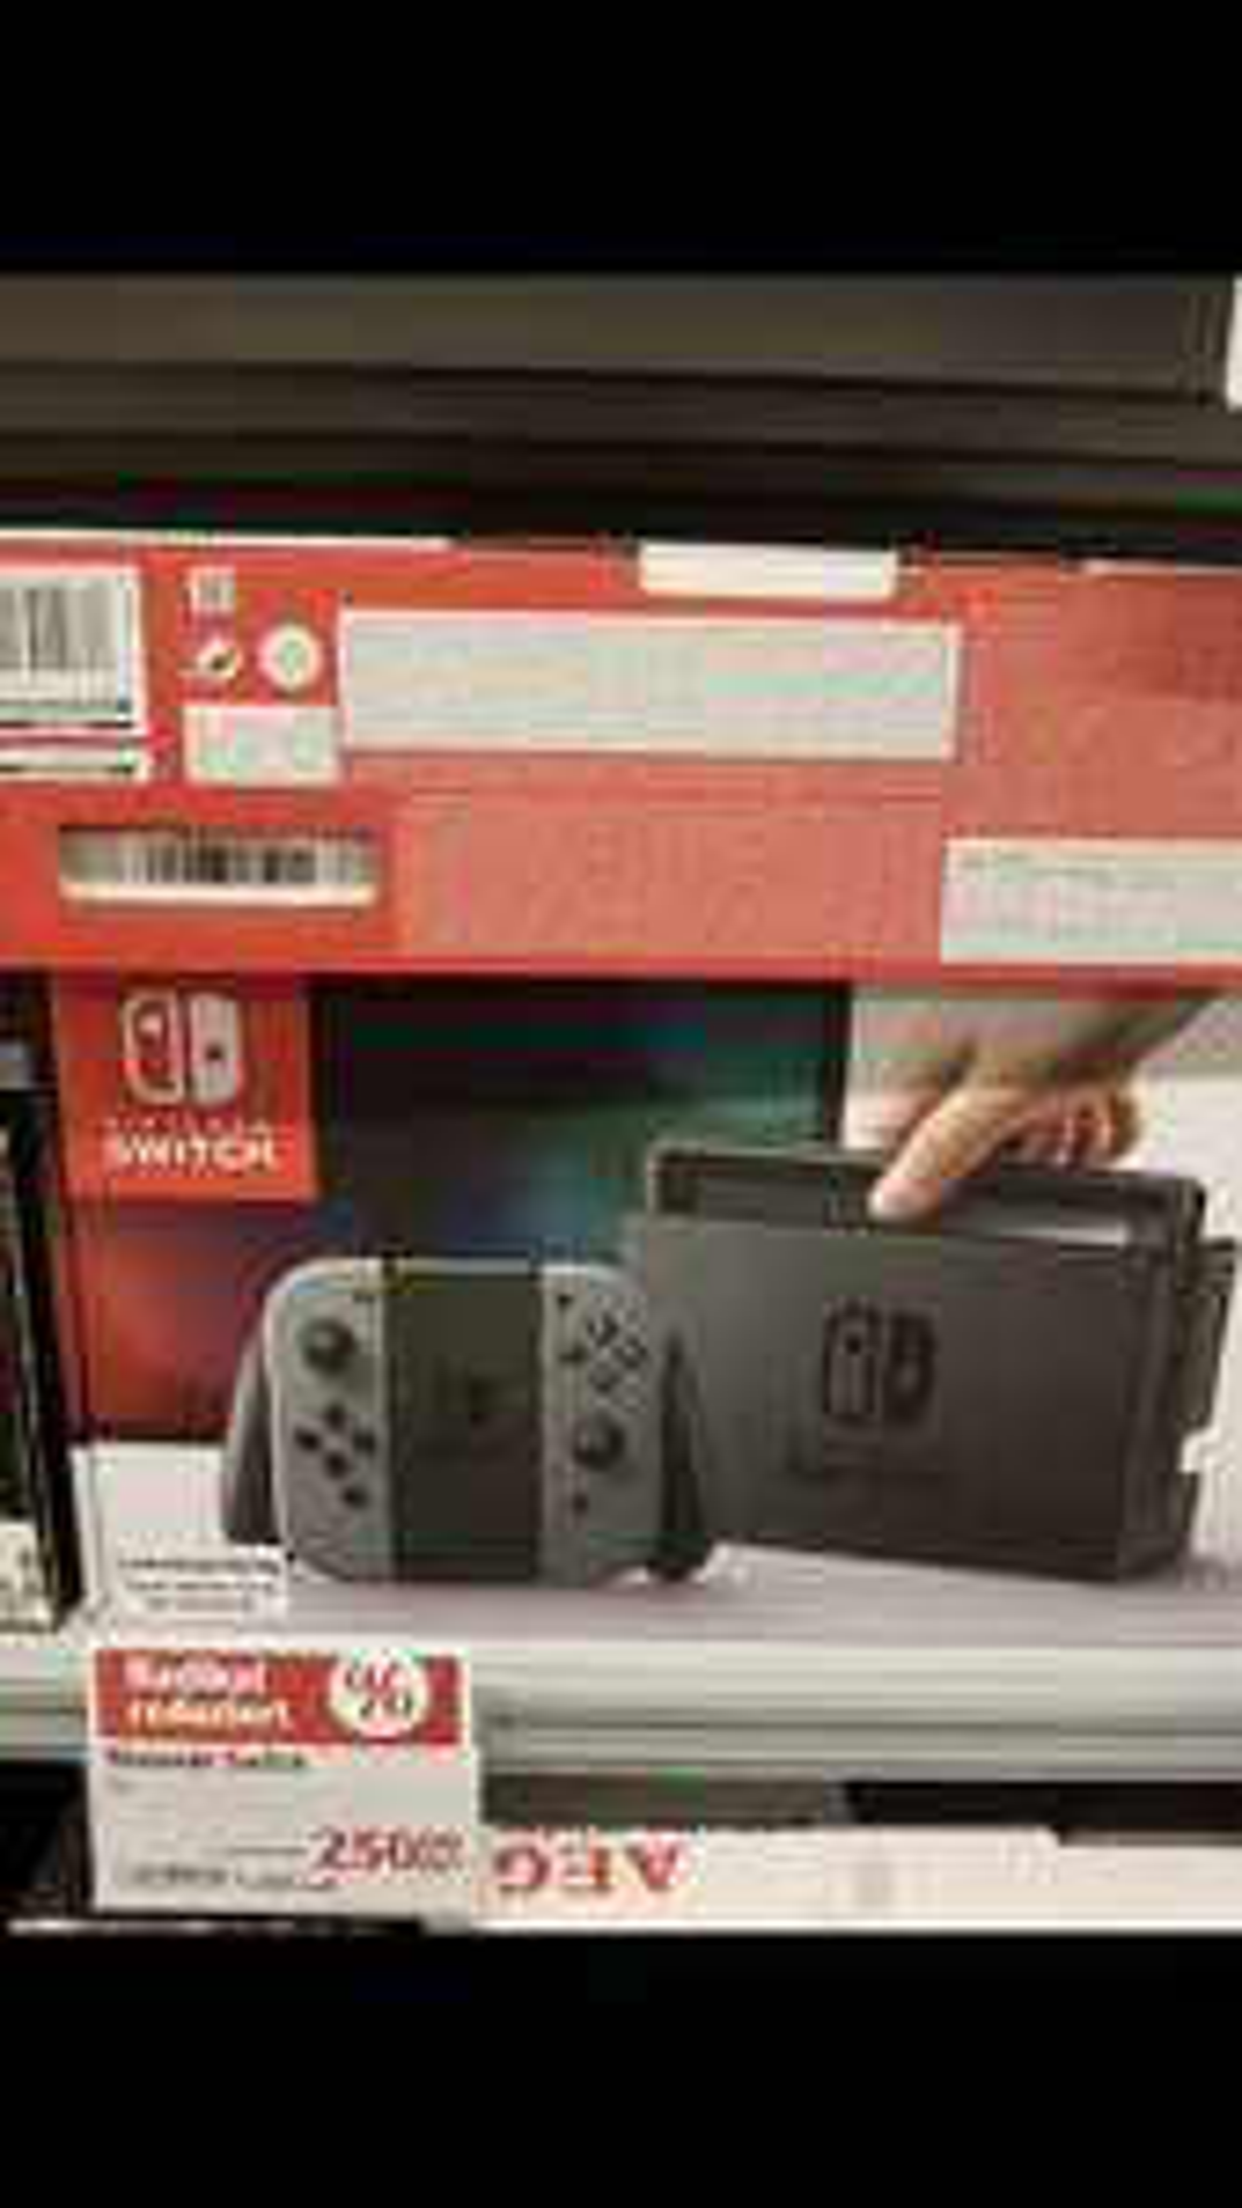 Nintendo Switch Lokal Plattling Globus